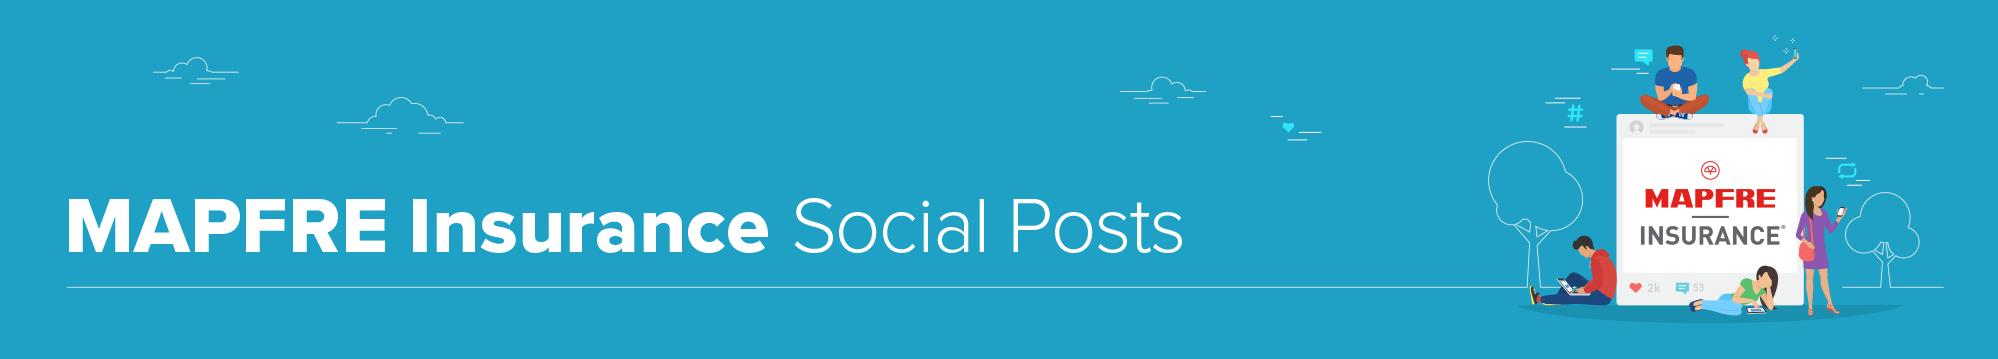 MAPFRE Insurance Social Posts